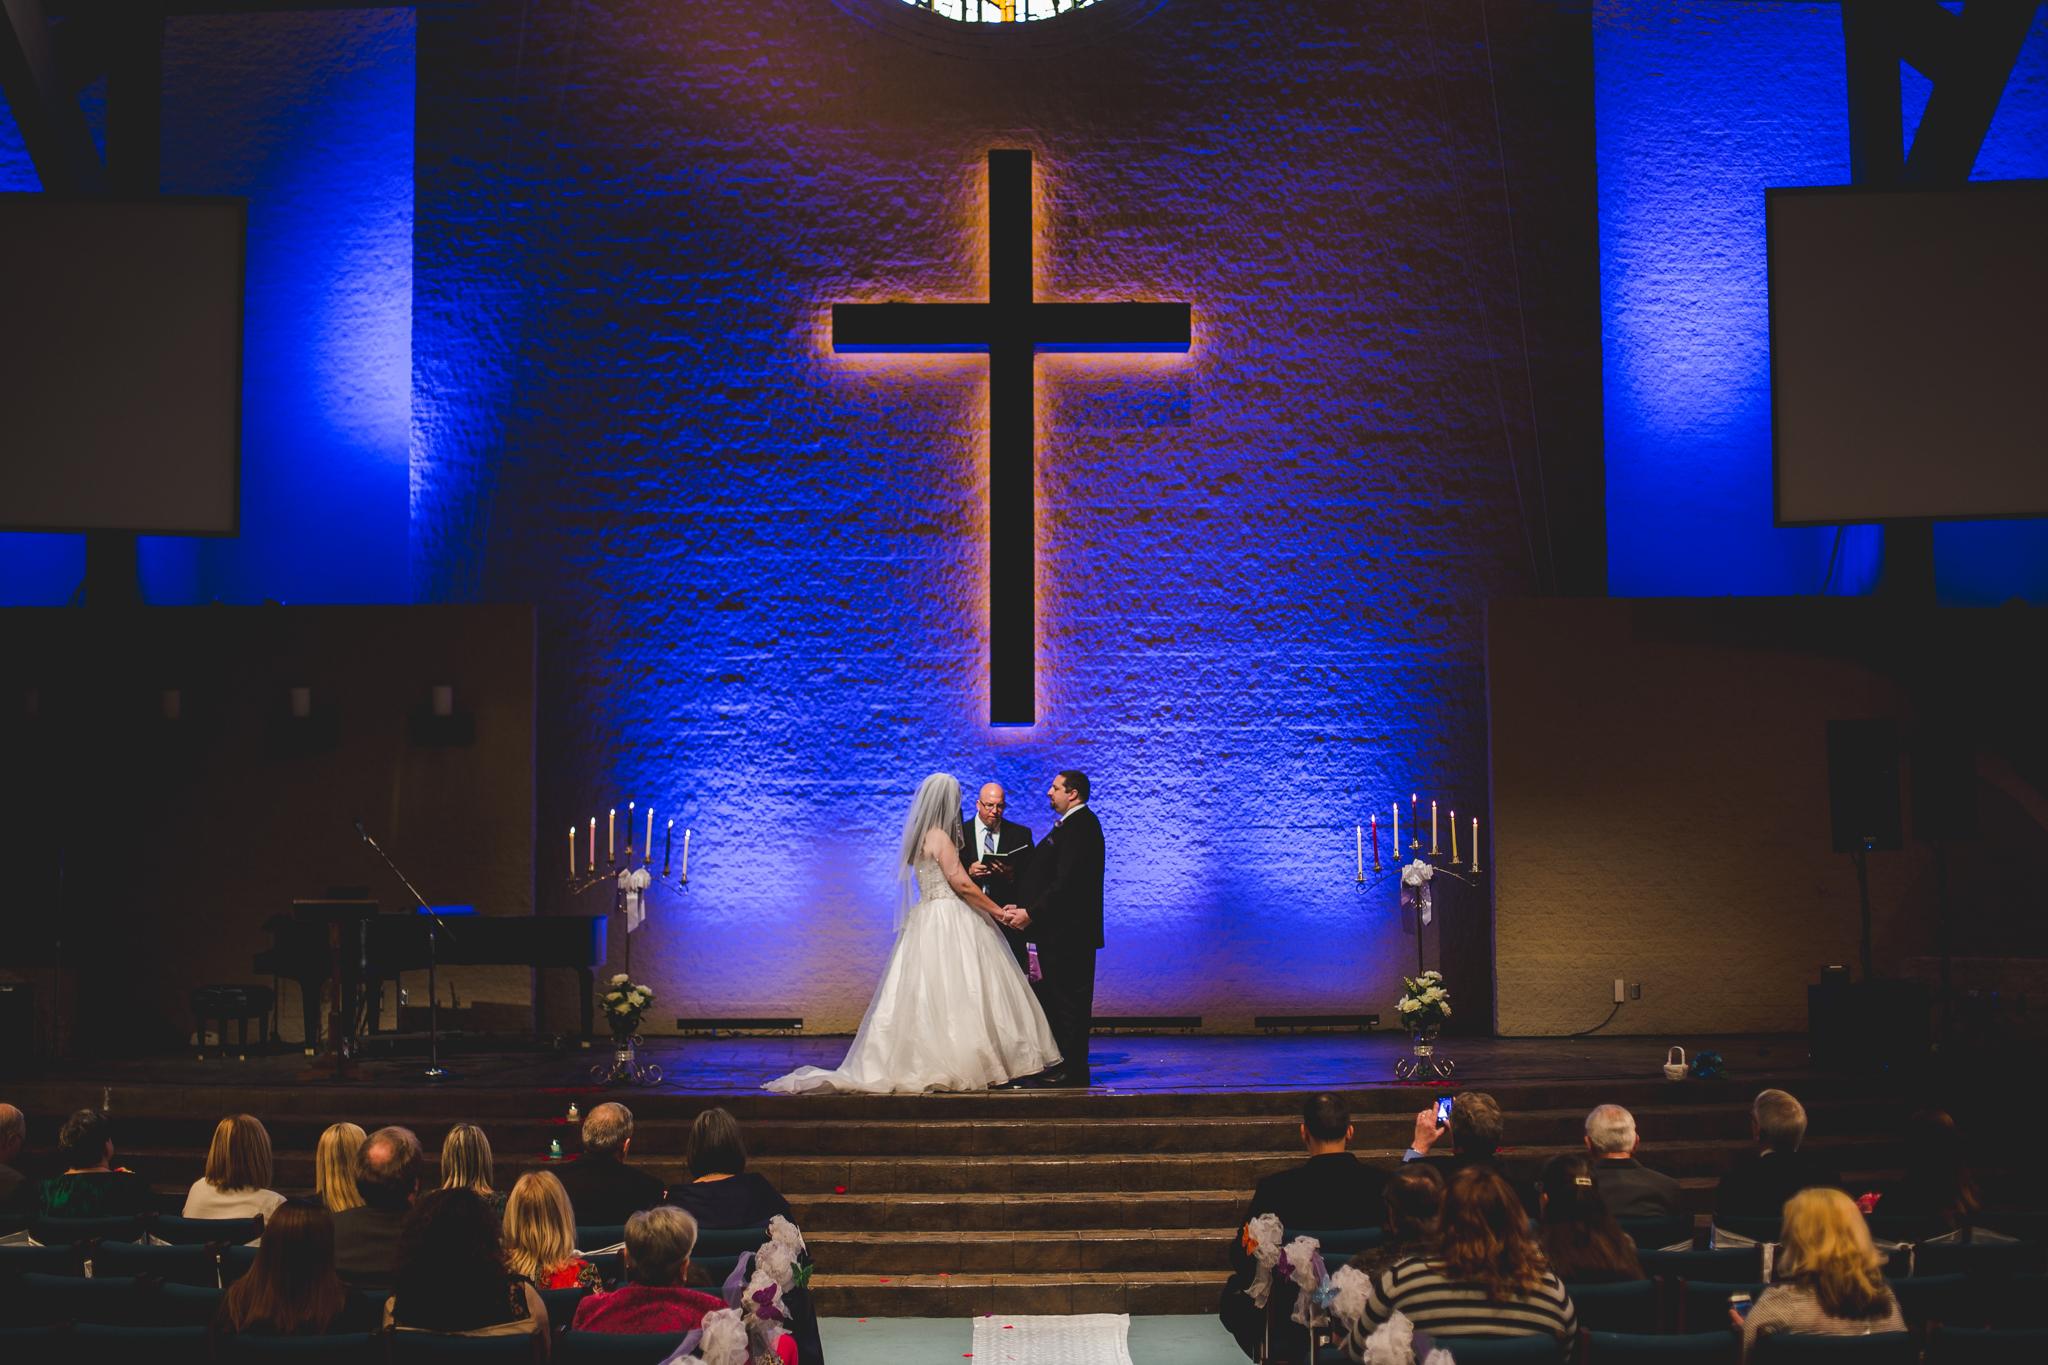 rs oklahoma city wedding wide angle of ceremony